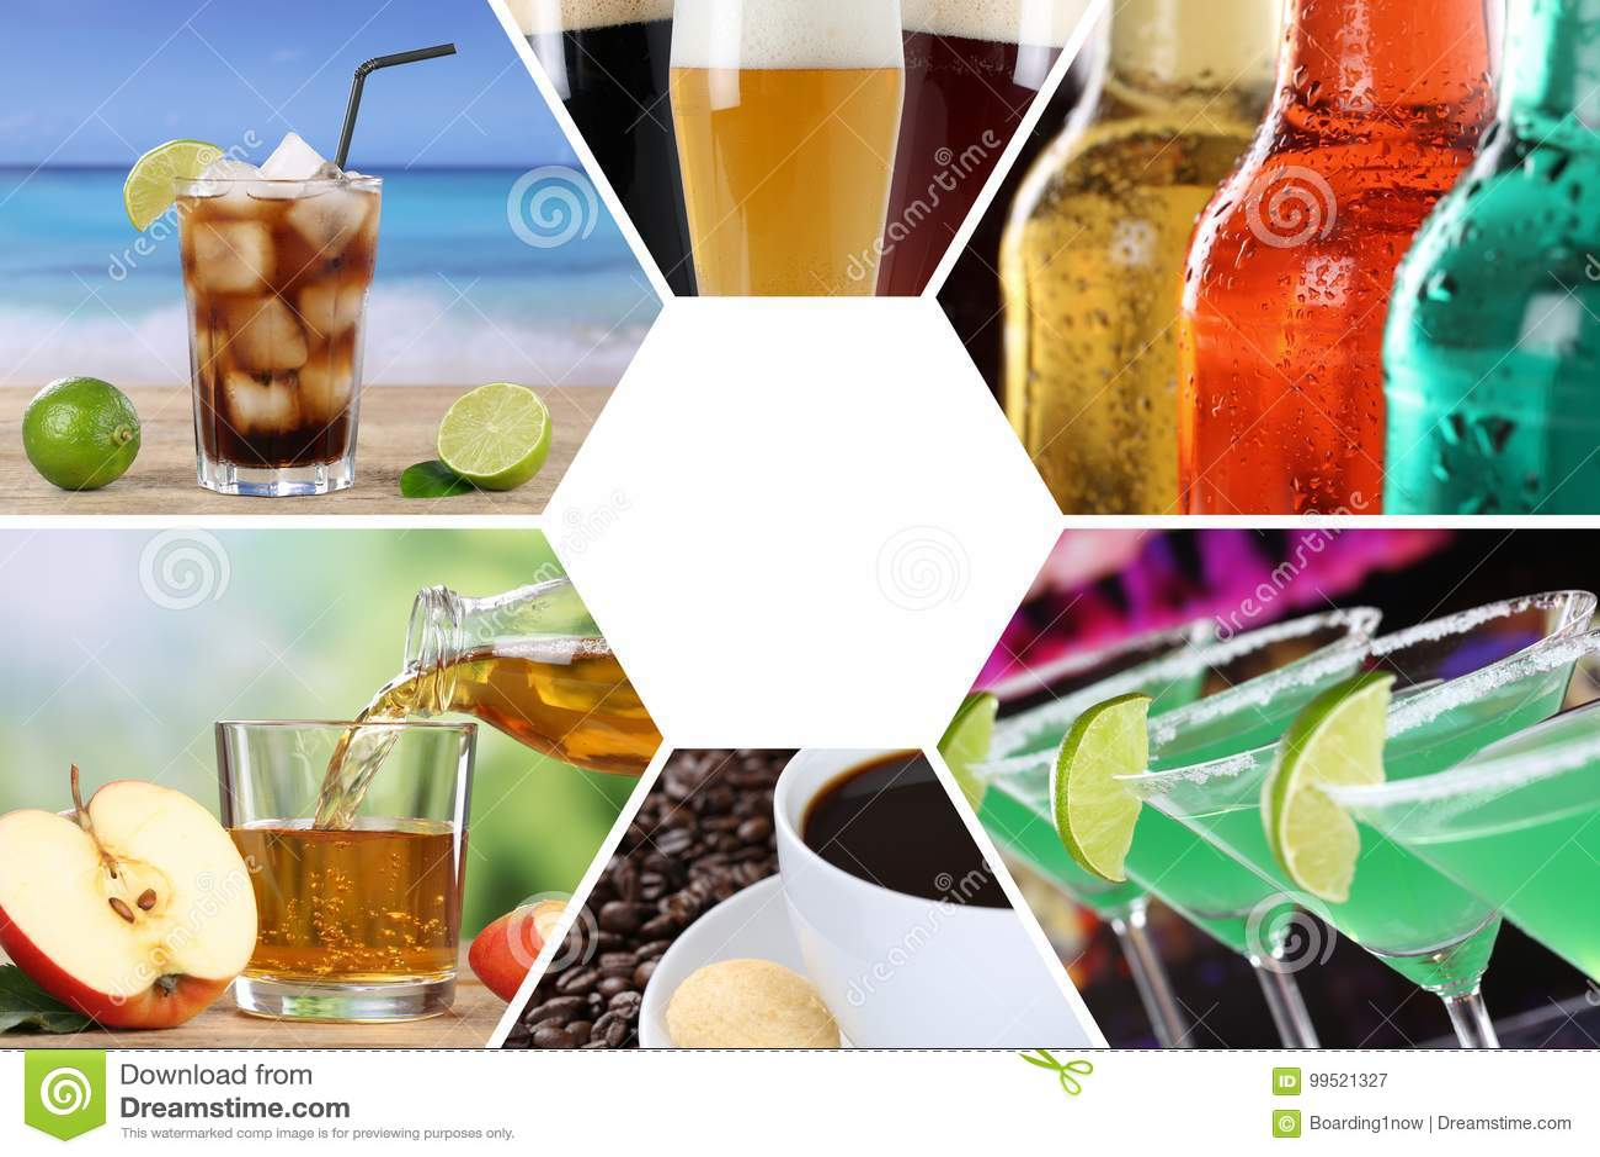 Drink menu collection collage beverages drinks restaurant bar